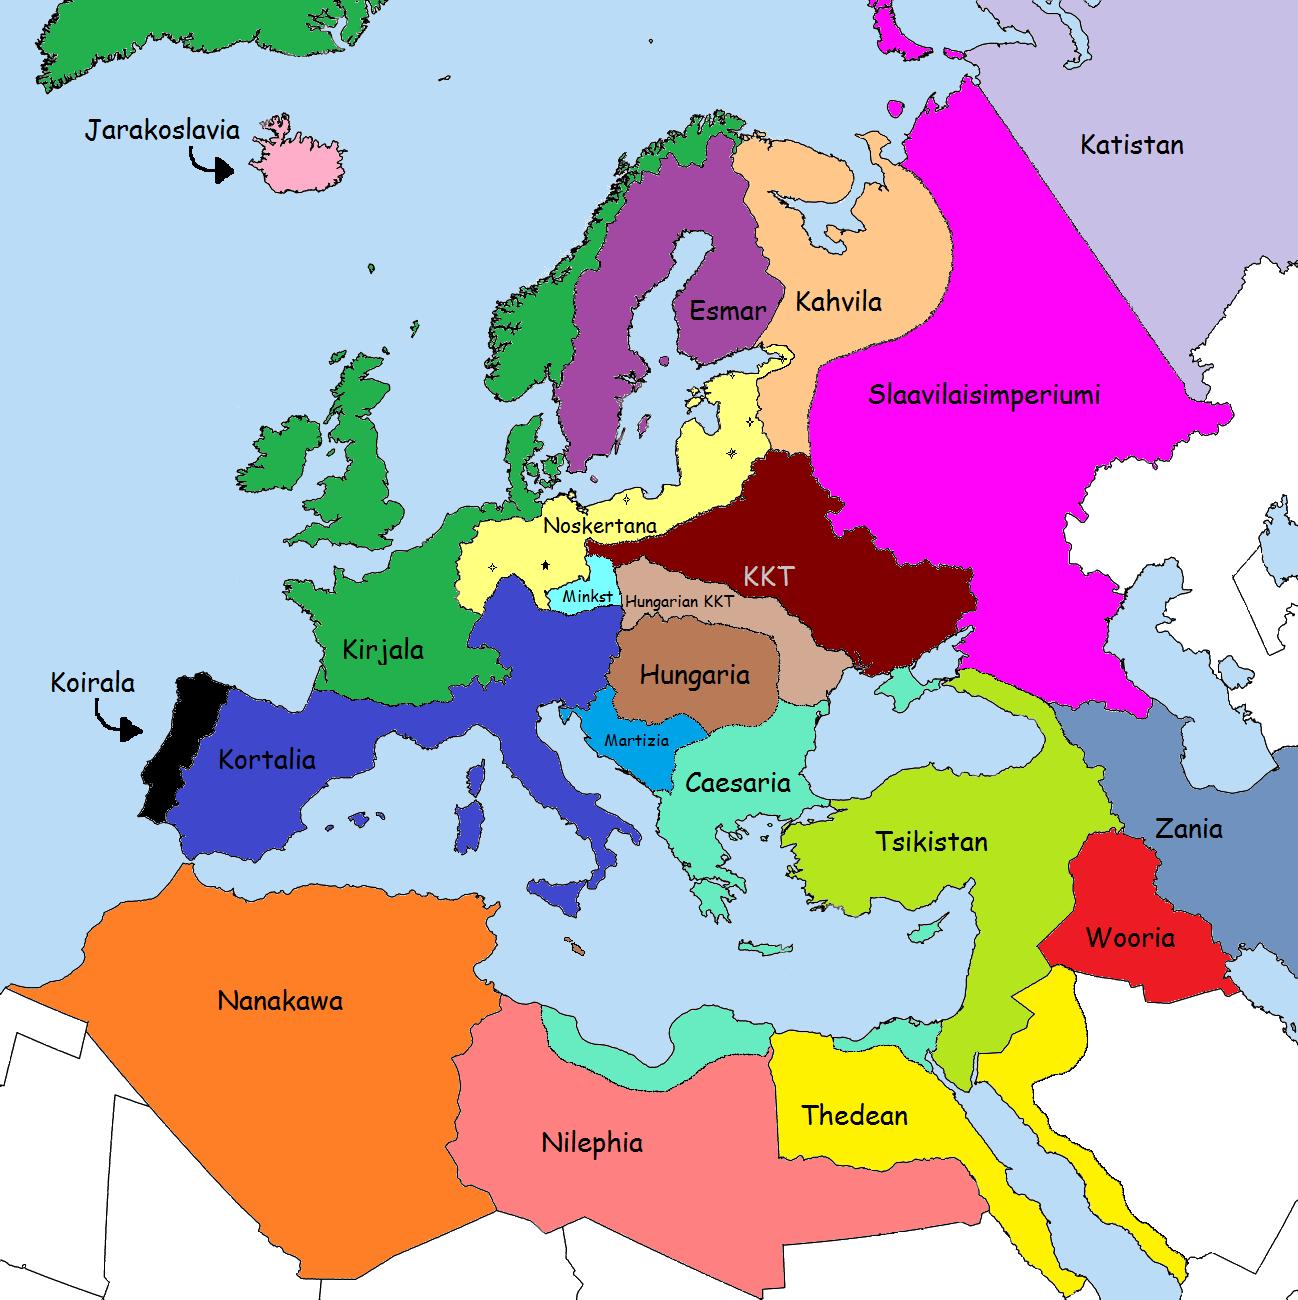 Image - Valtiopeli11 kartta eurooppa.png | Valtiopeli Wiki | FANDOM powered by Wikia